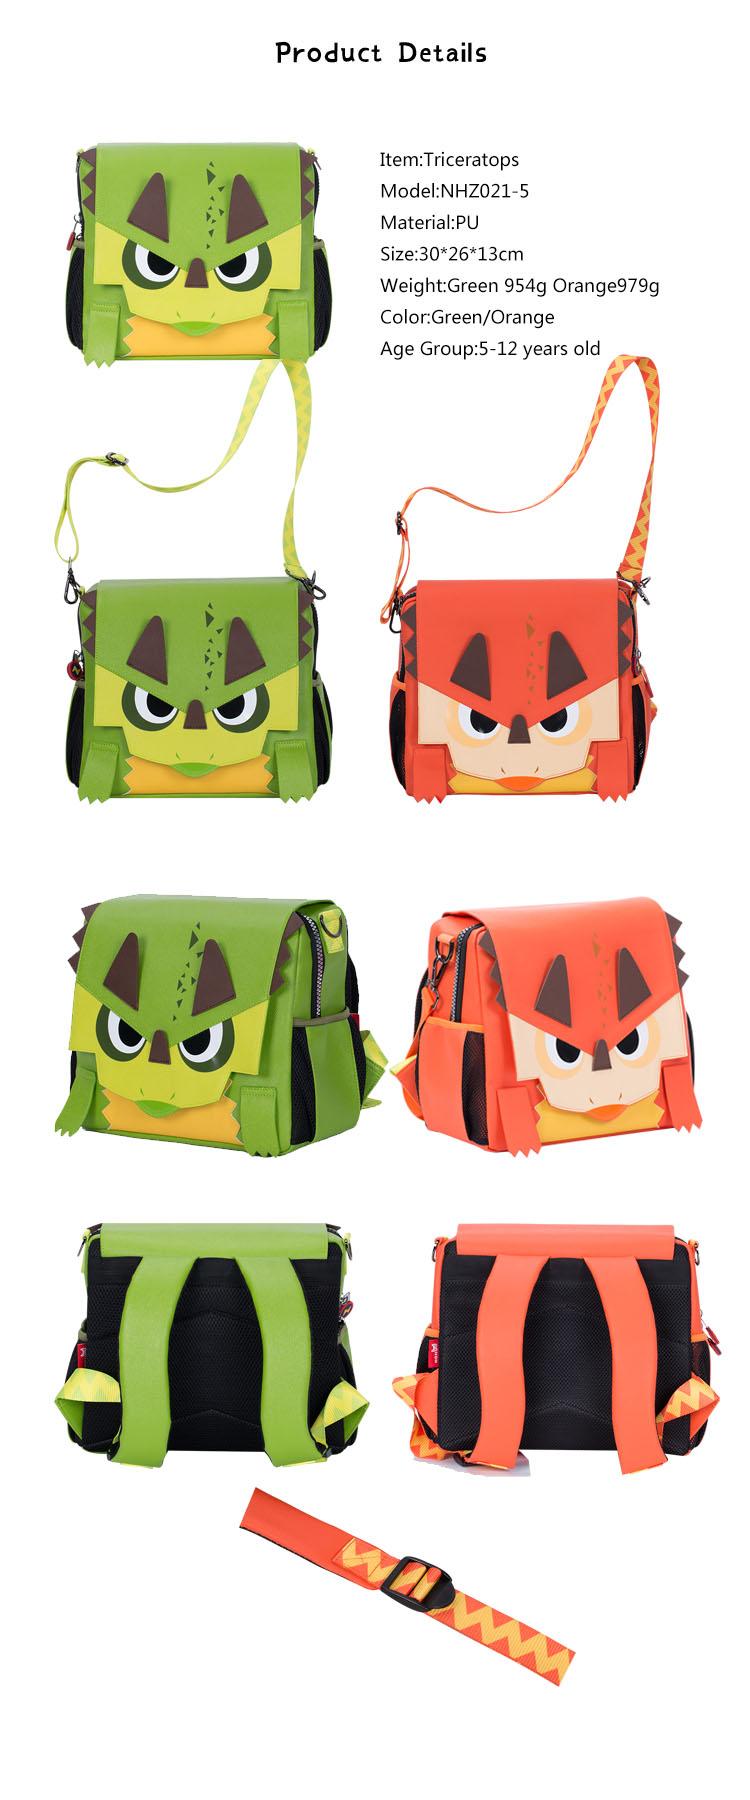 Nohoo Children Products-Custom Kids Backpack Manufacturer, Older Girls School Bags   Nohoo Children